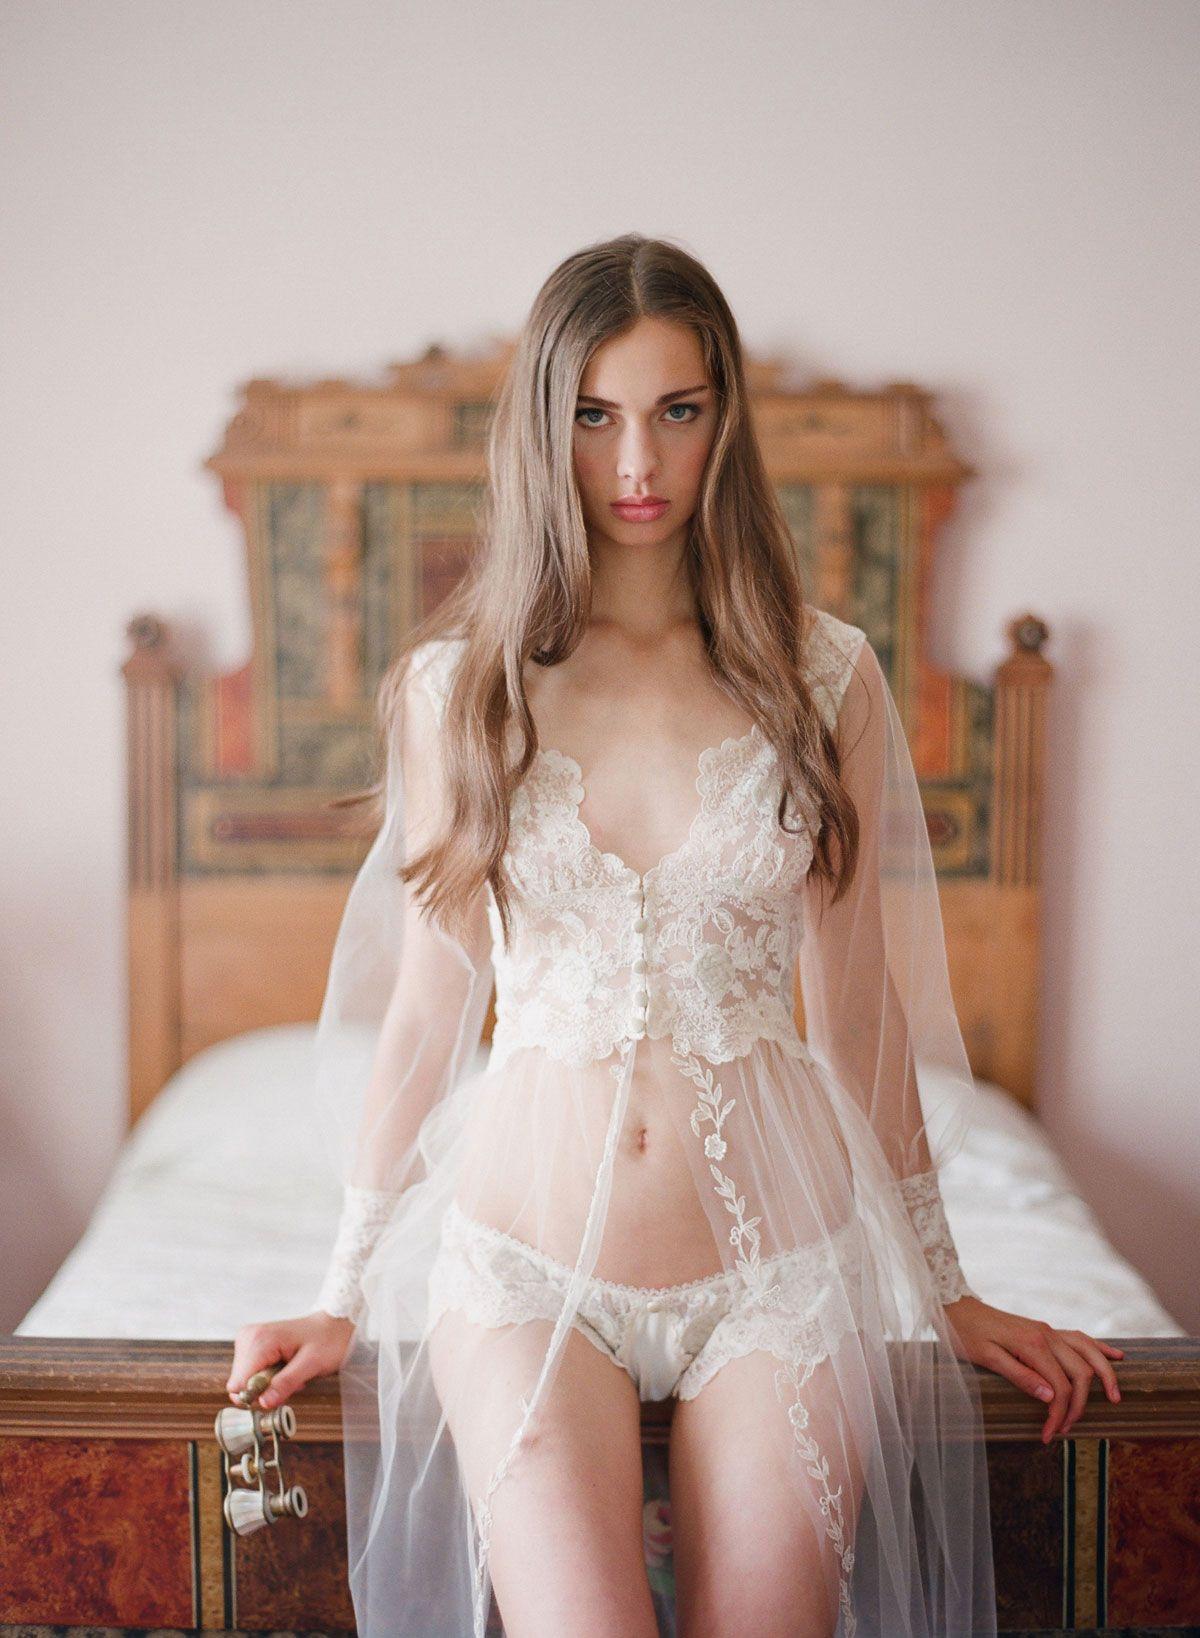 Lanas fantasies bare pussy